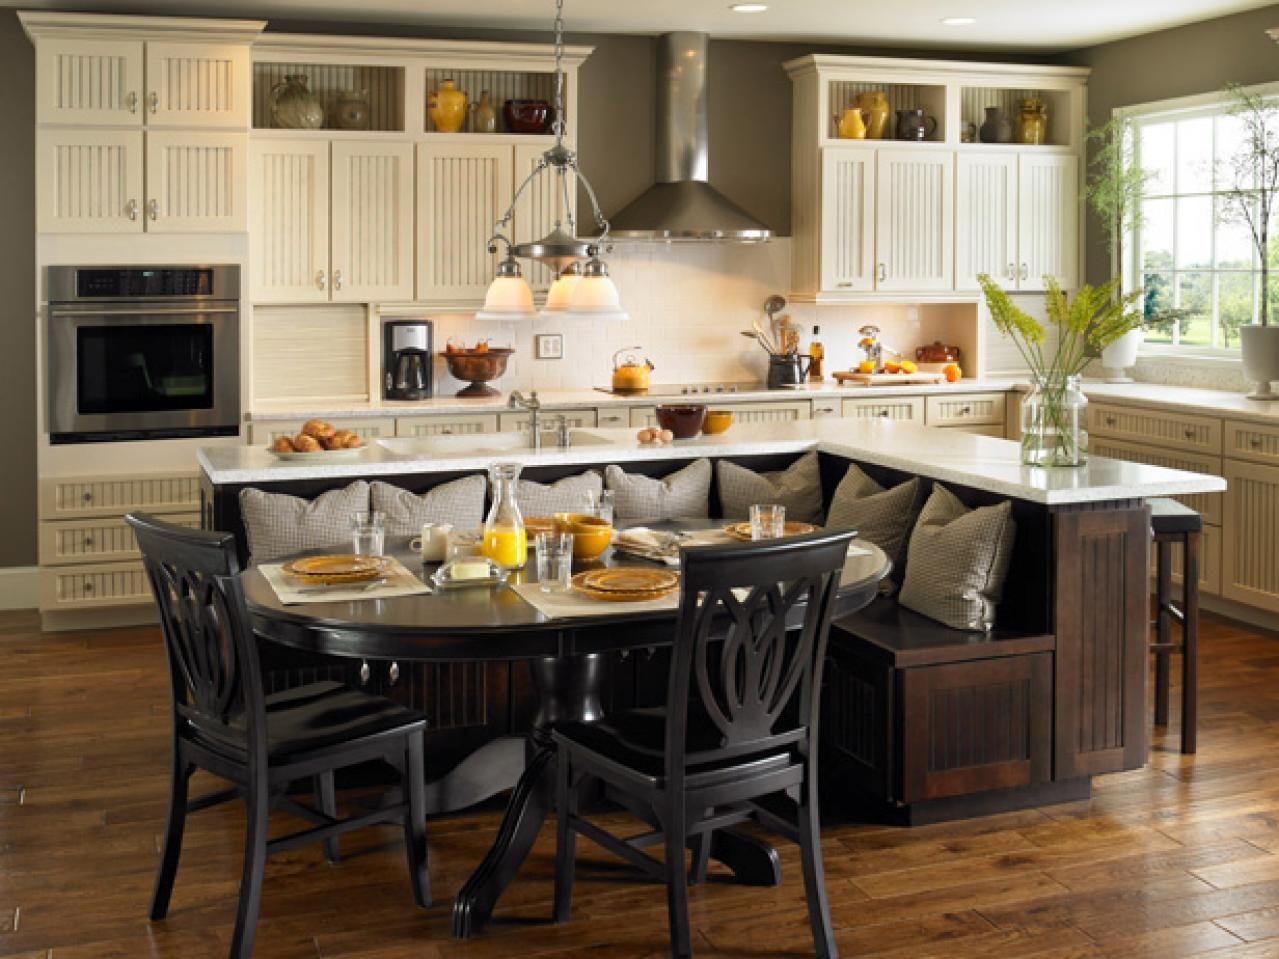 Kitchen Island Table Ideas And Options Hgtv Pictures Kitchen Idea Kitchen Island Built In Seating Kitchen Island Designs With Seating Kitchen Island Design